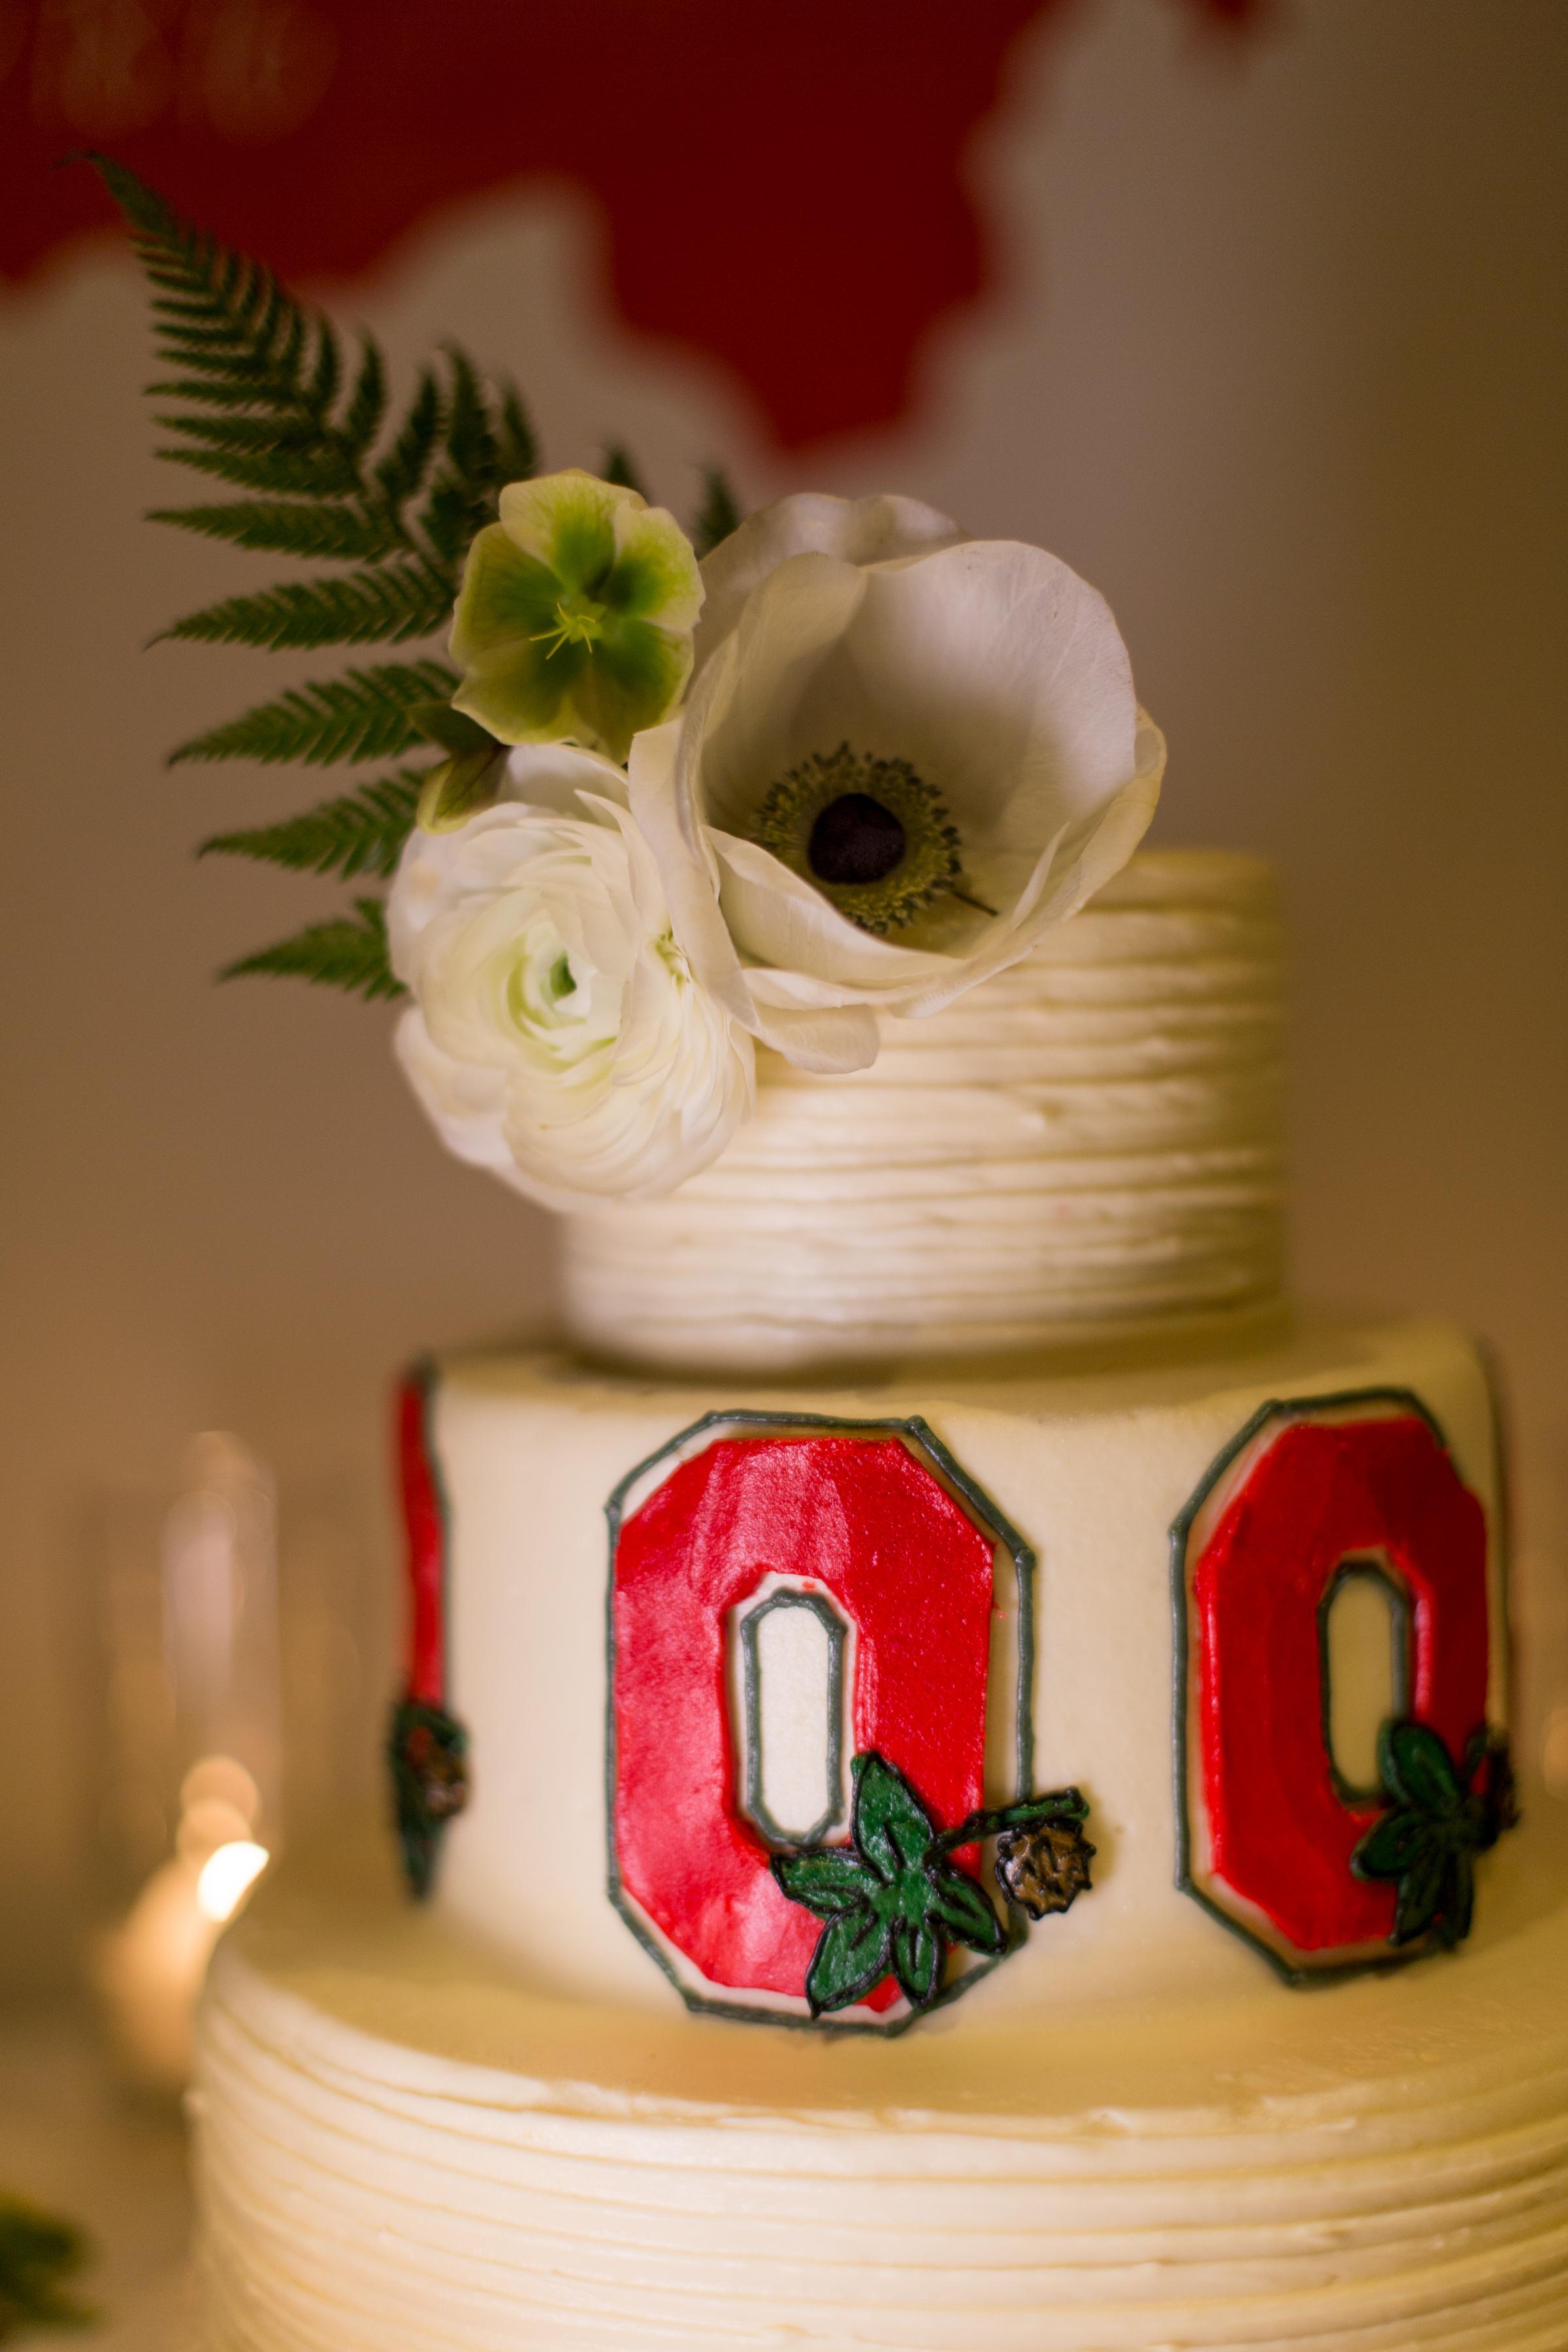 050 - cake.jpg